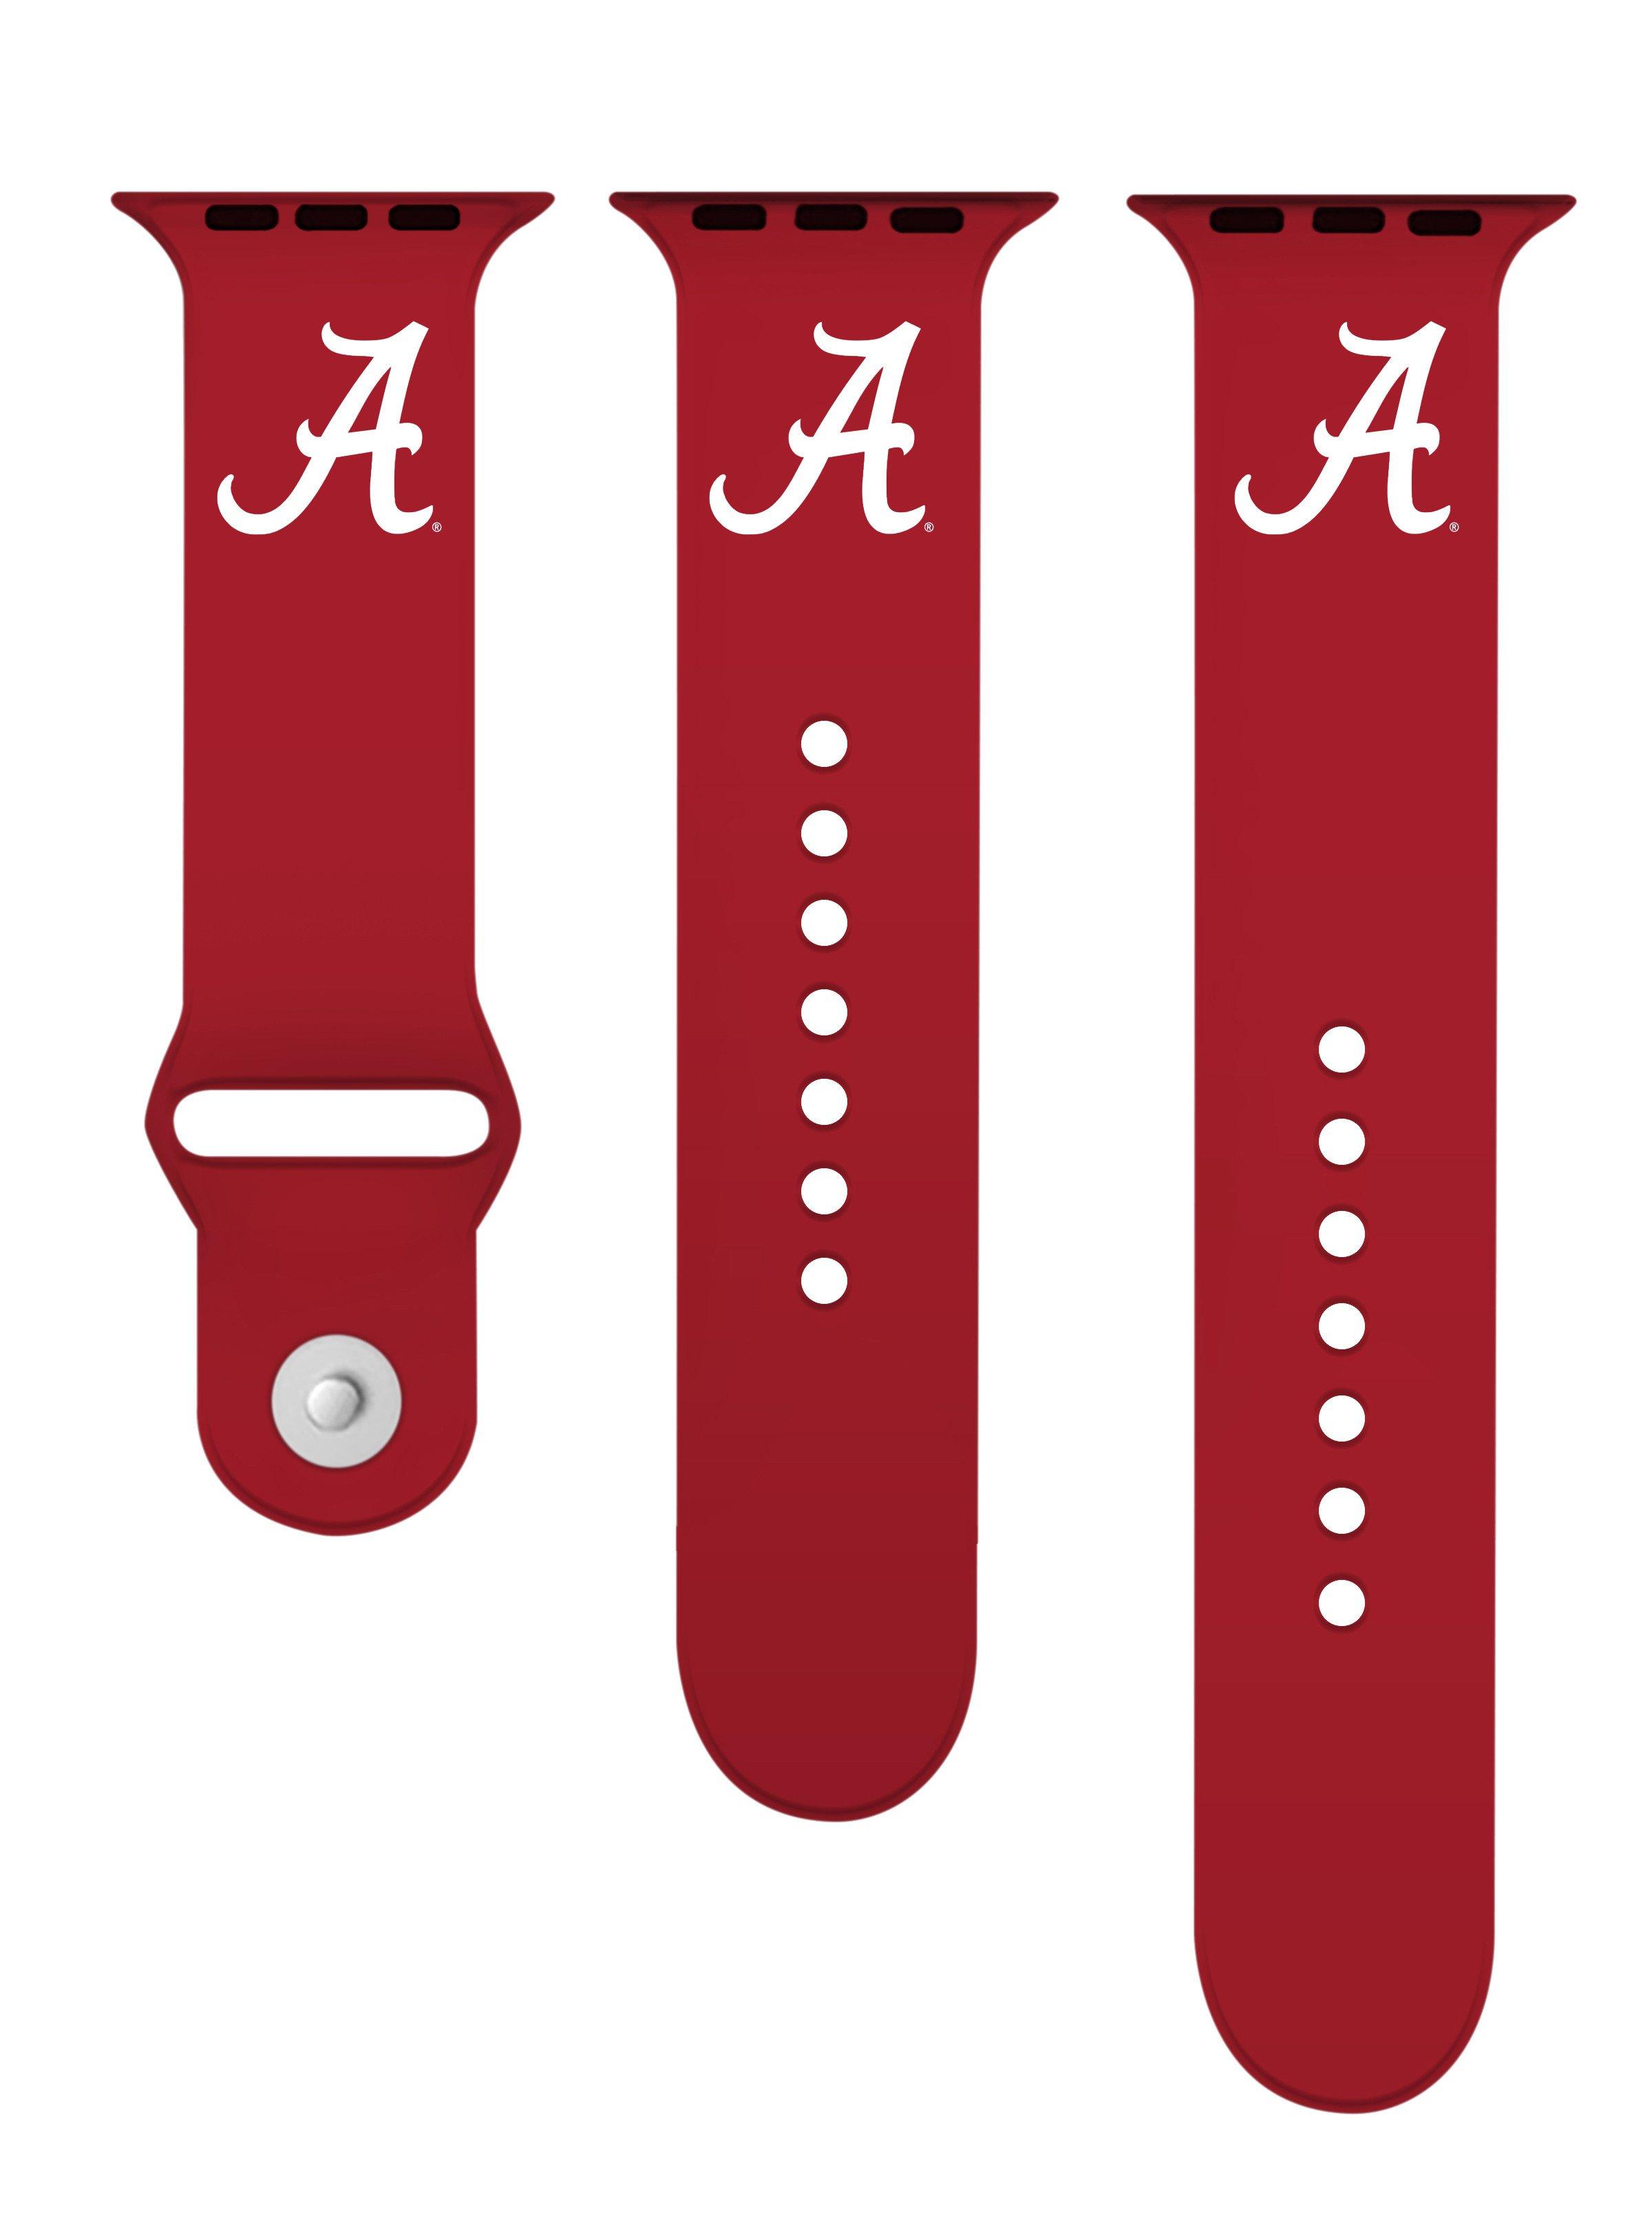 2400x3248 Alabama Crimson Tide Apple Band Insane Fans